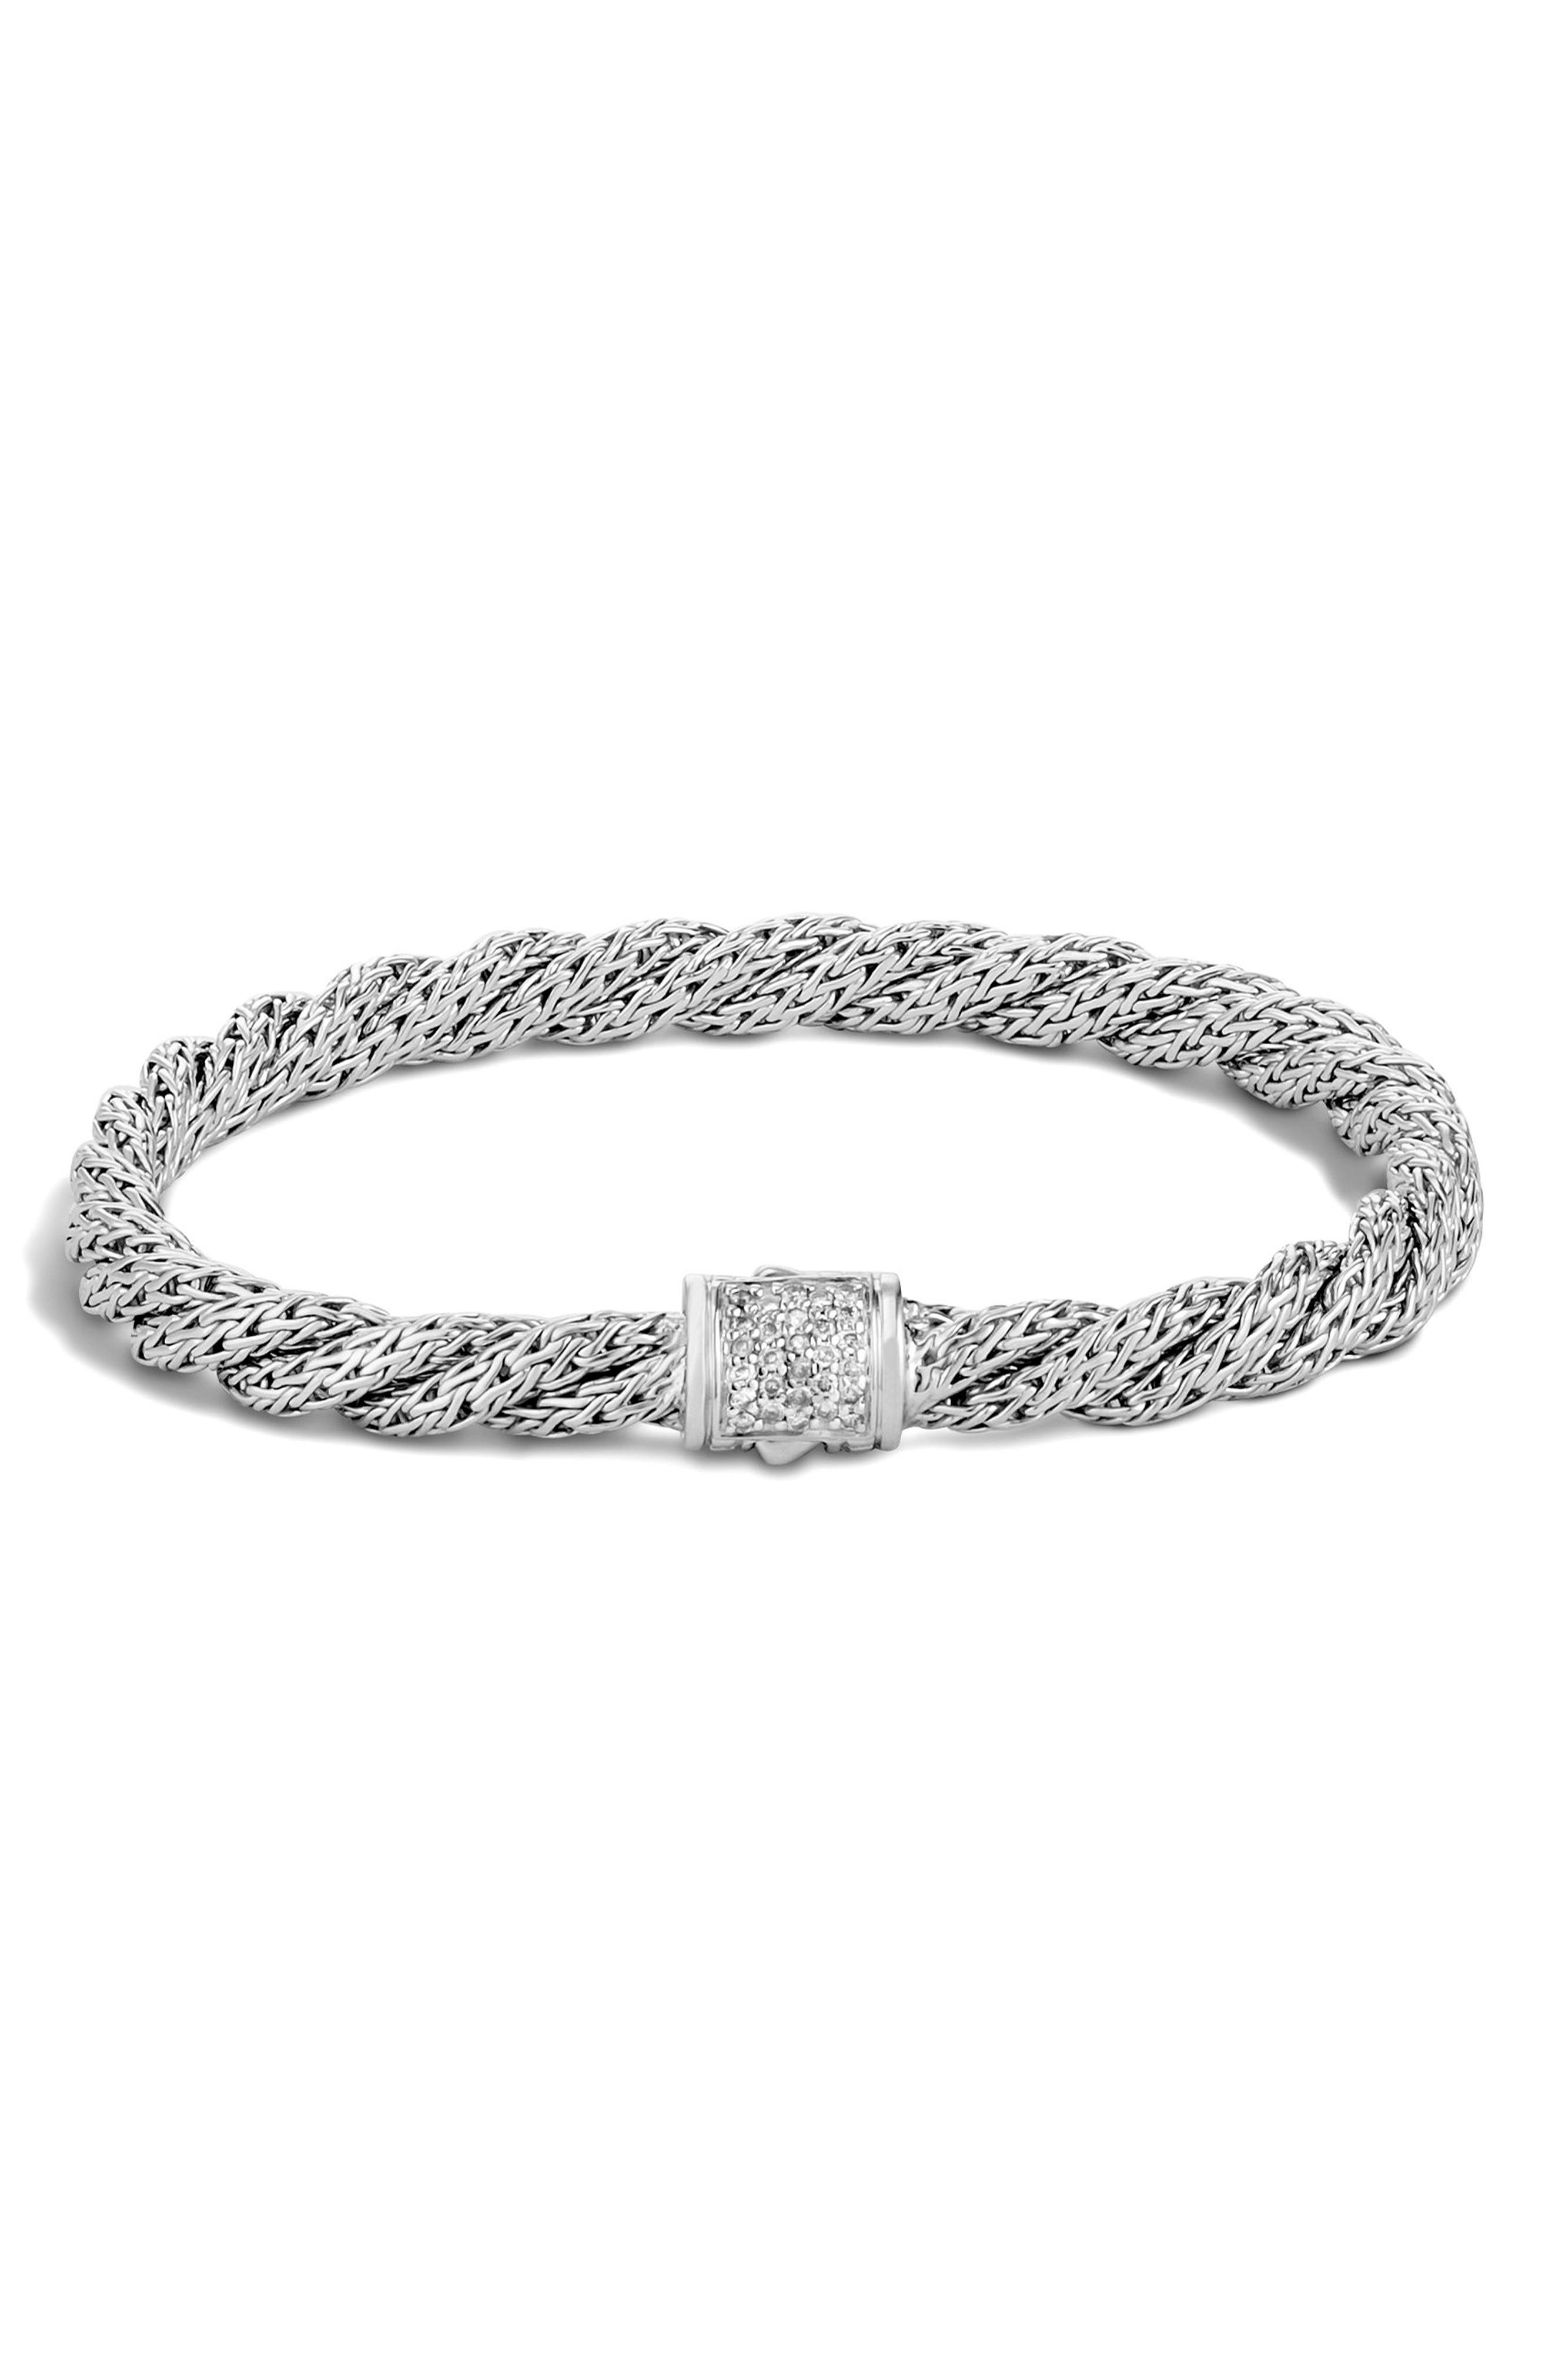 Twist Chain 5mm Bracelet with Diamonds,                         Main,                         color, SILVER/ DIAMOND